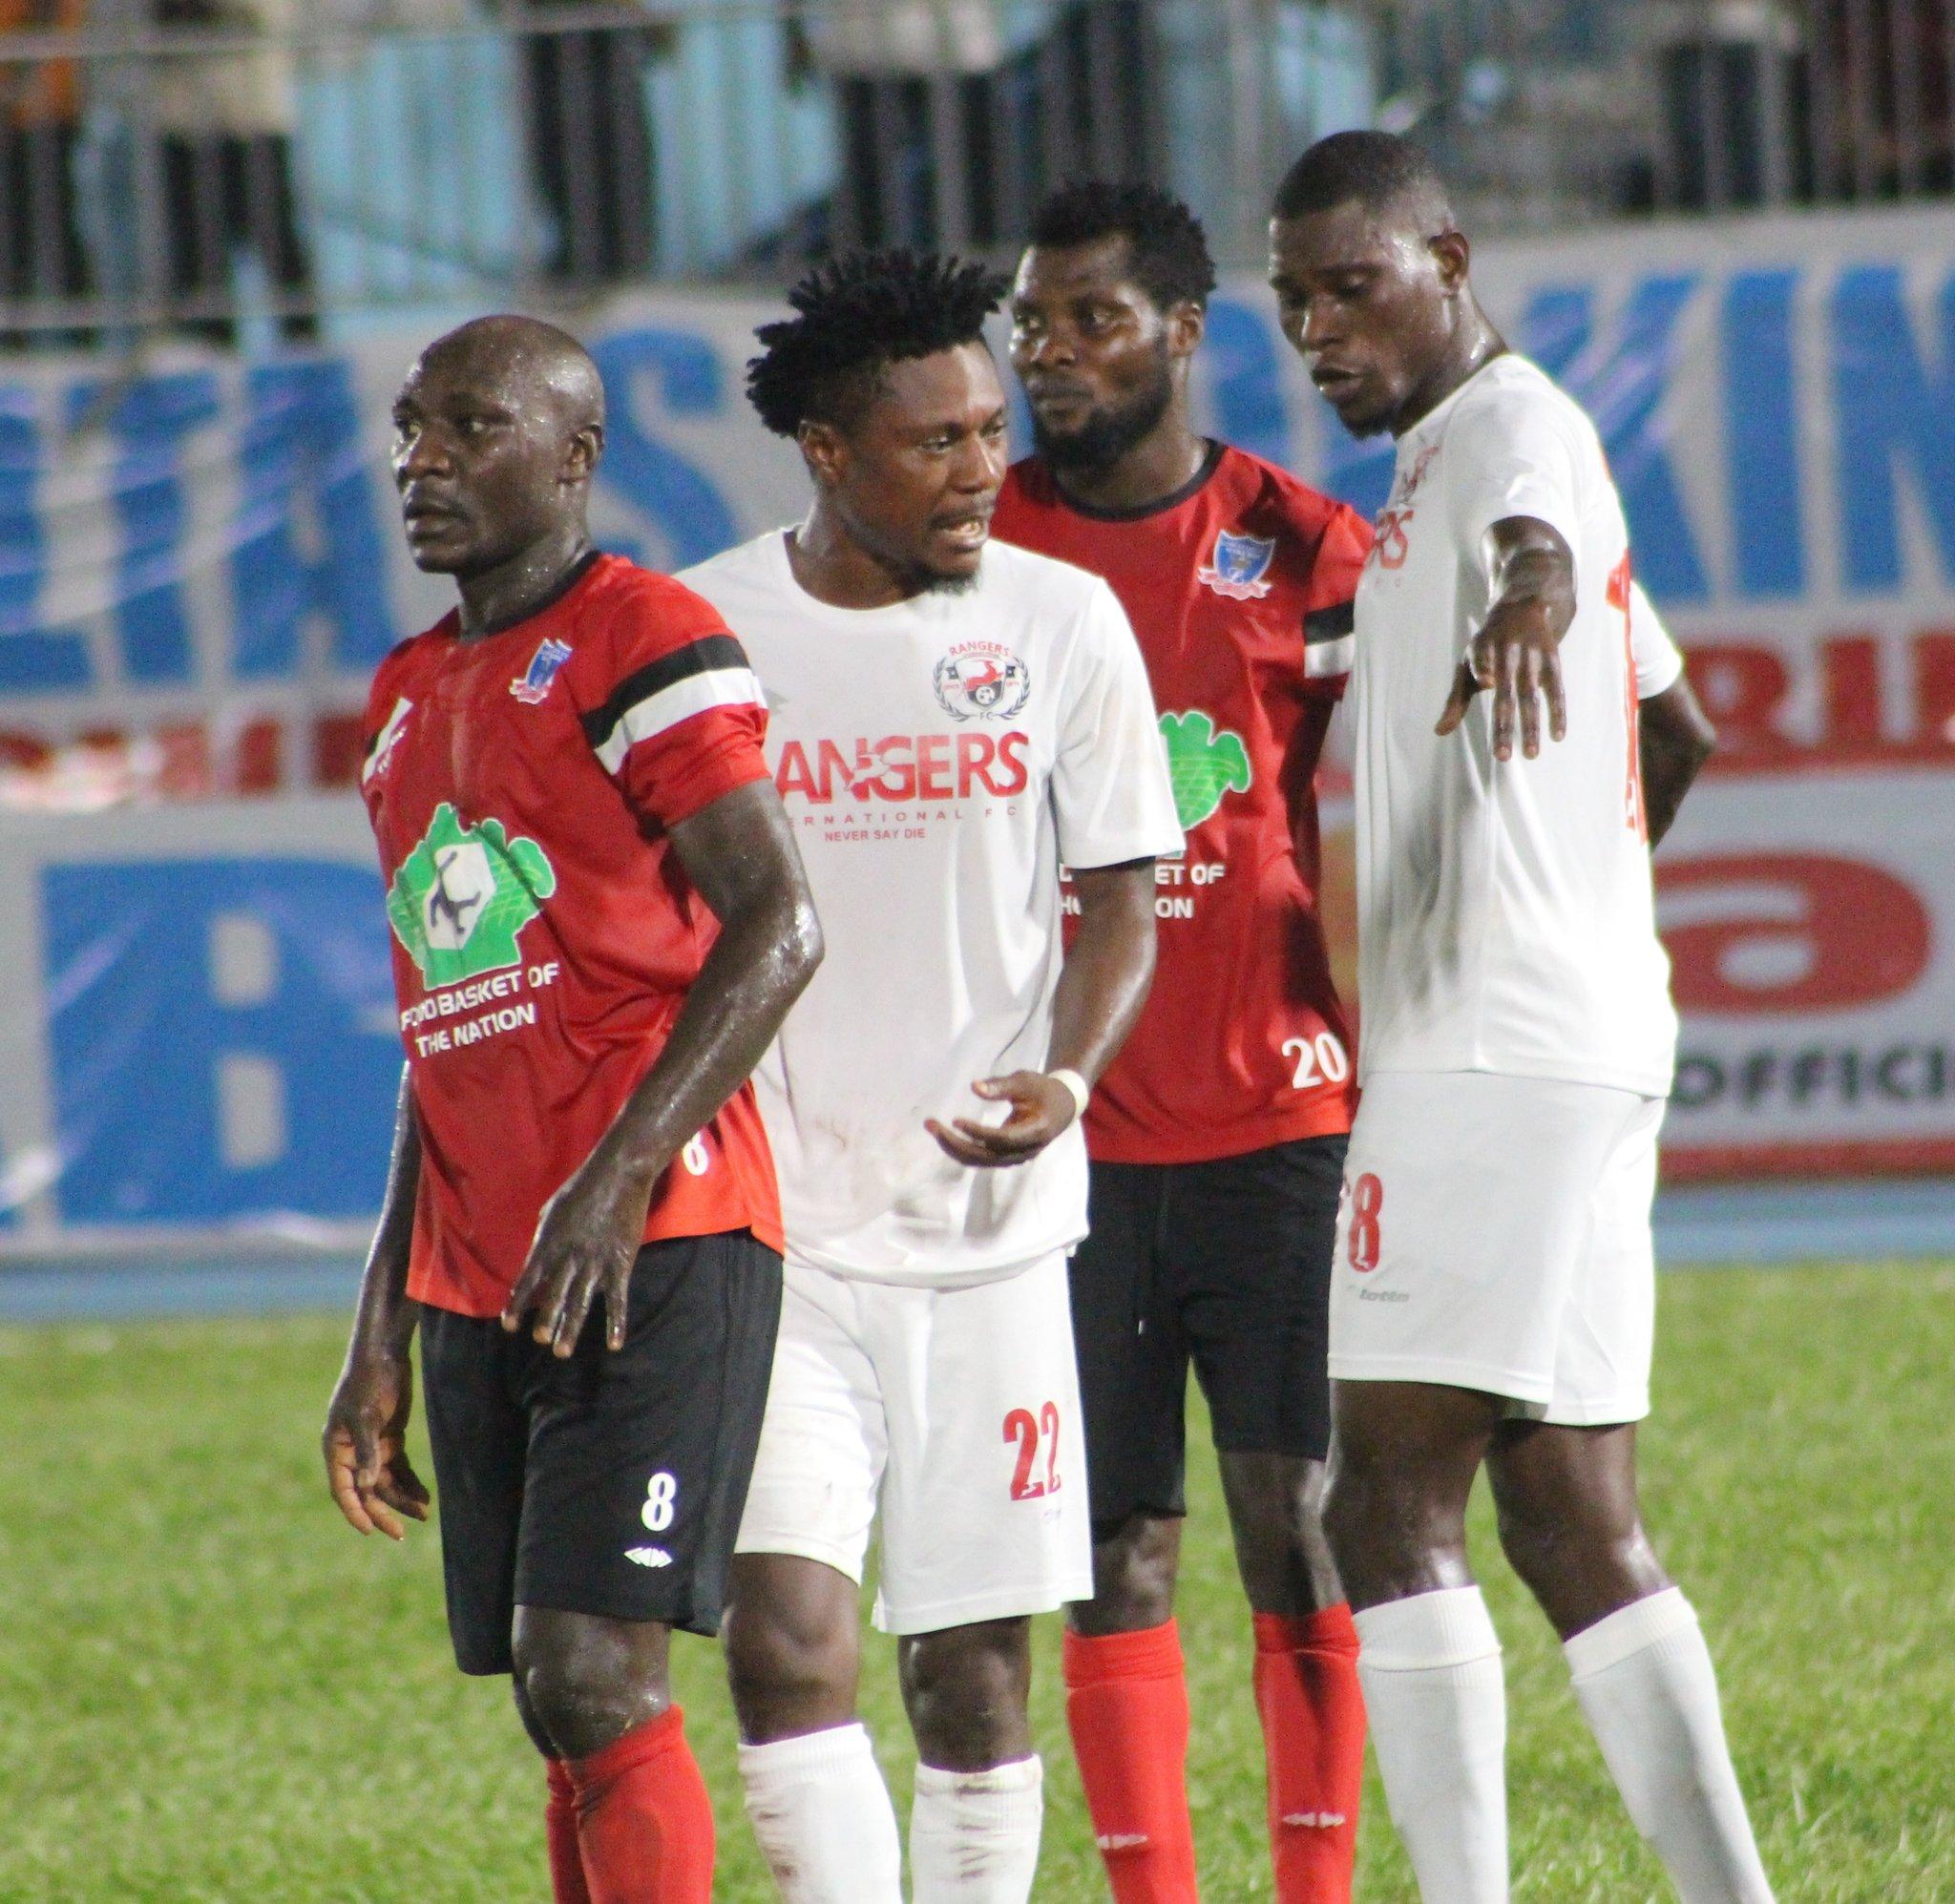 Lobi Stars Edge Rangers To Win Nigerian Super Cup Title